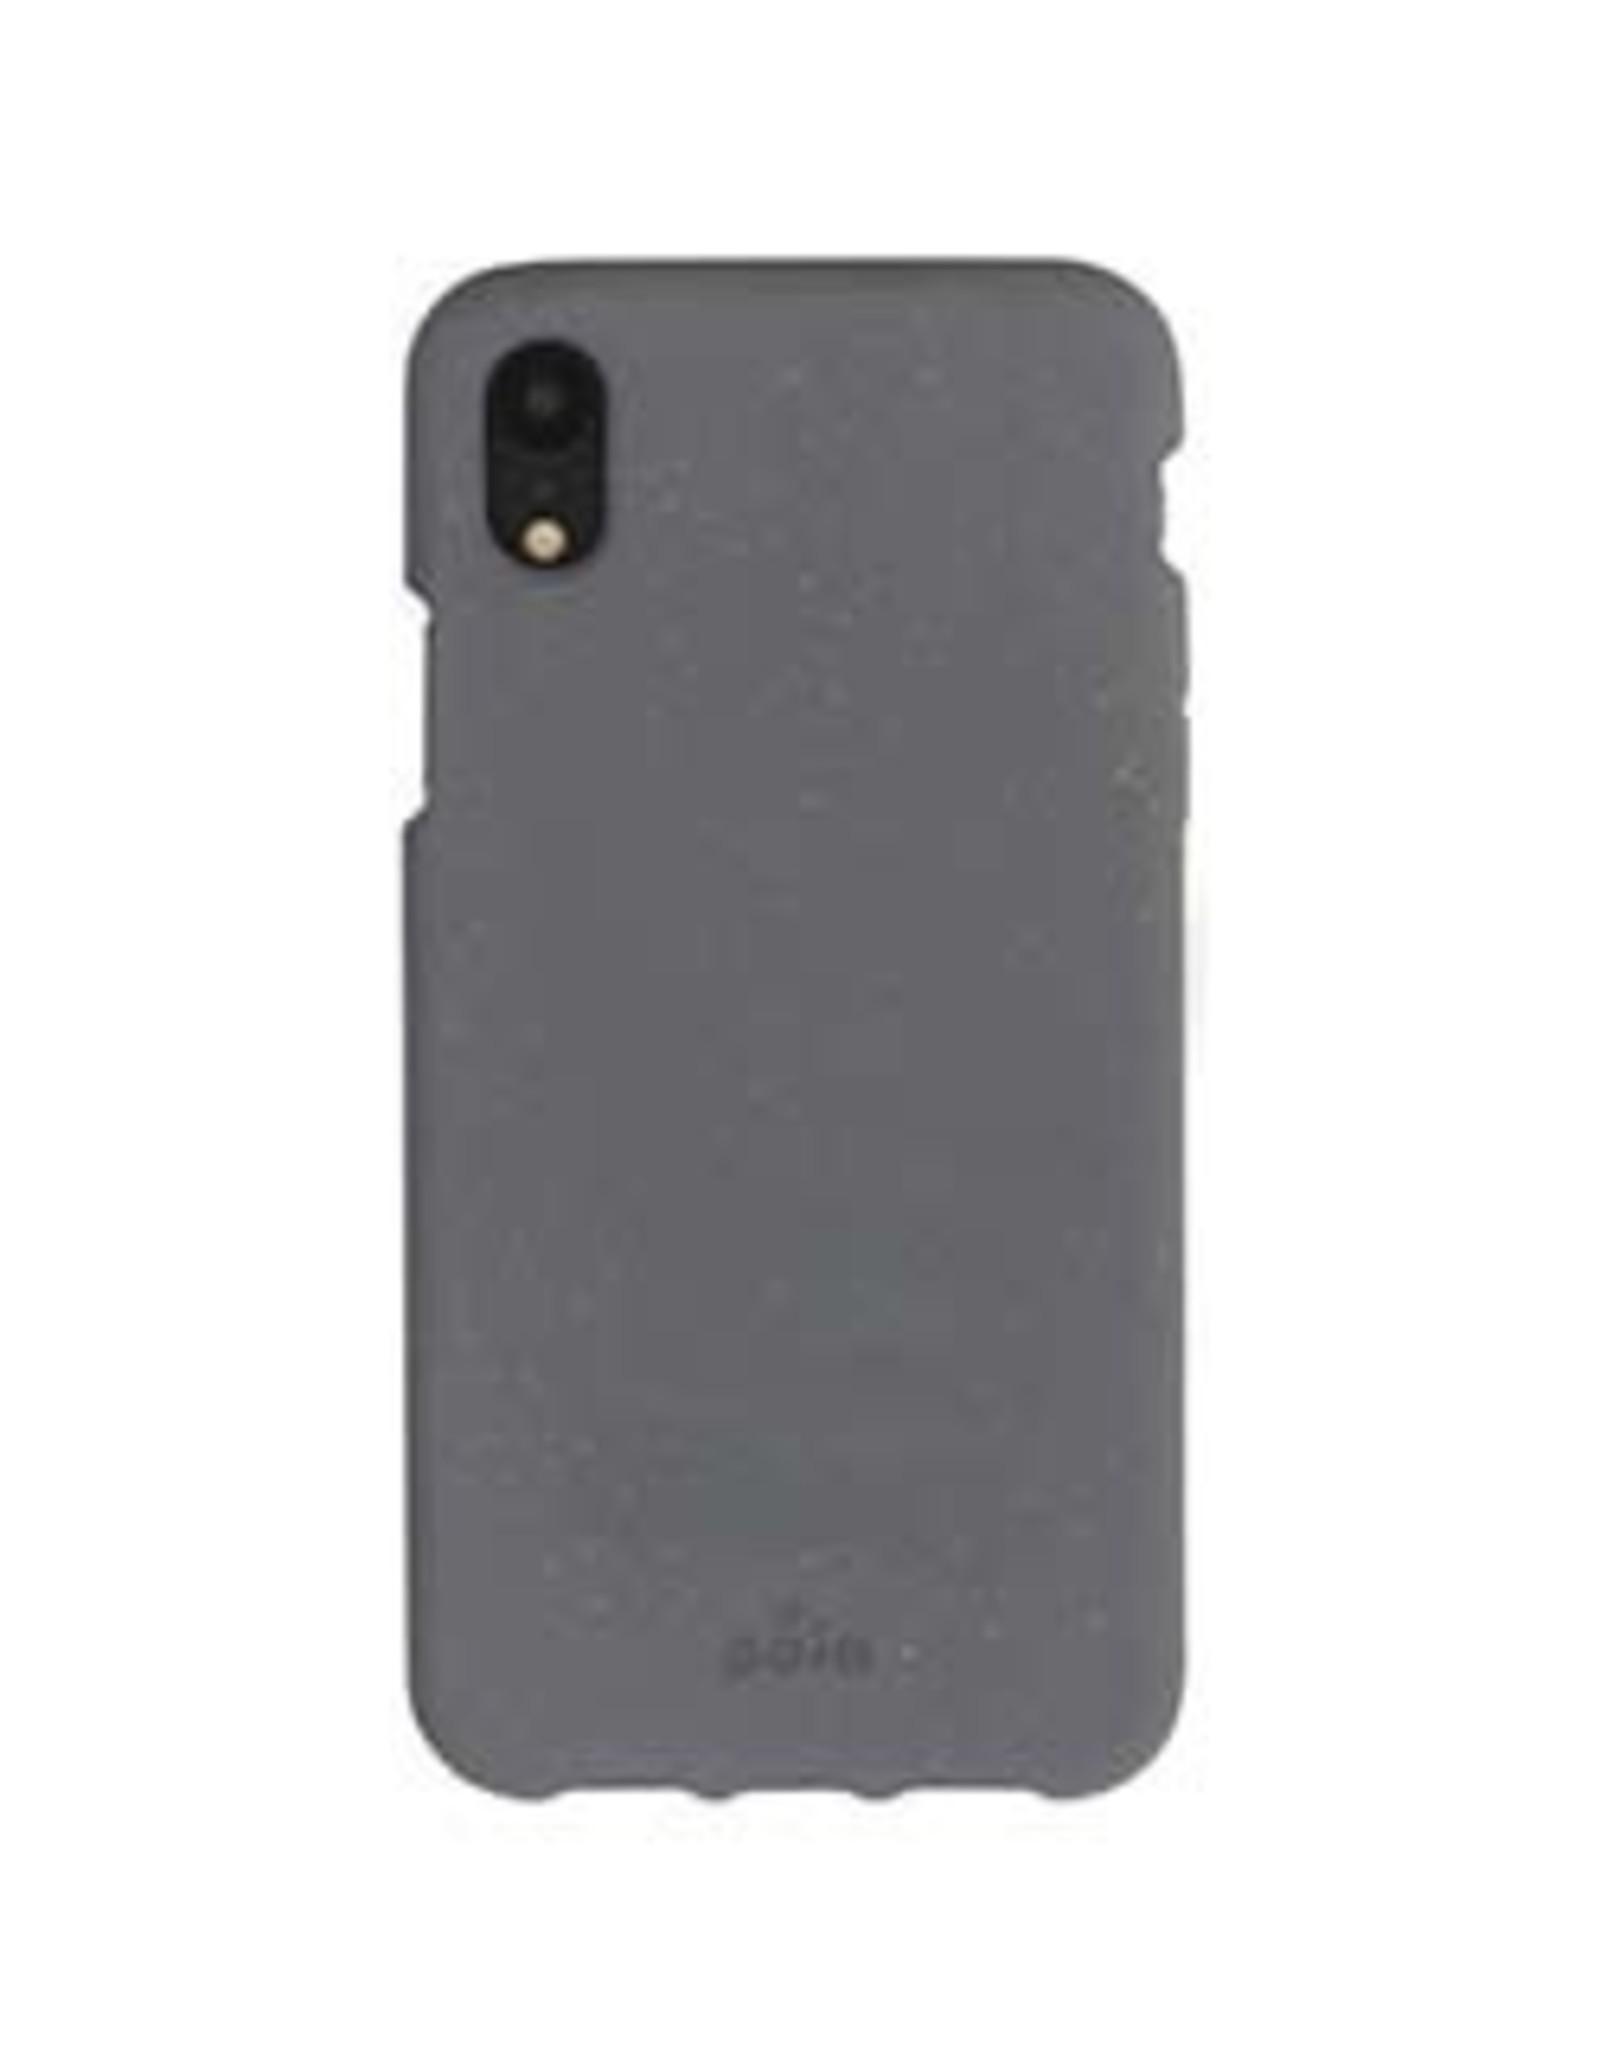 Pela Pela   iPhone XR Grey (Shark Skin) Compostable Eco-Friendly Protective Case 15-04714